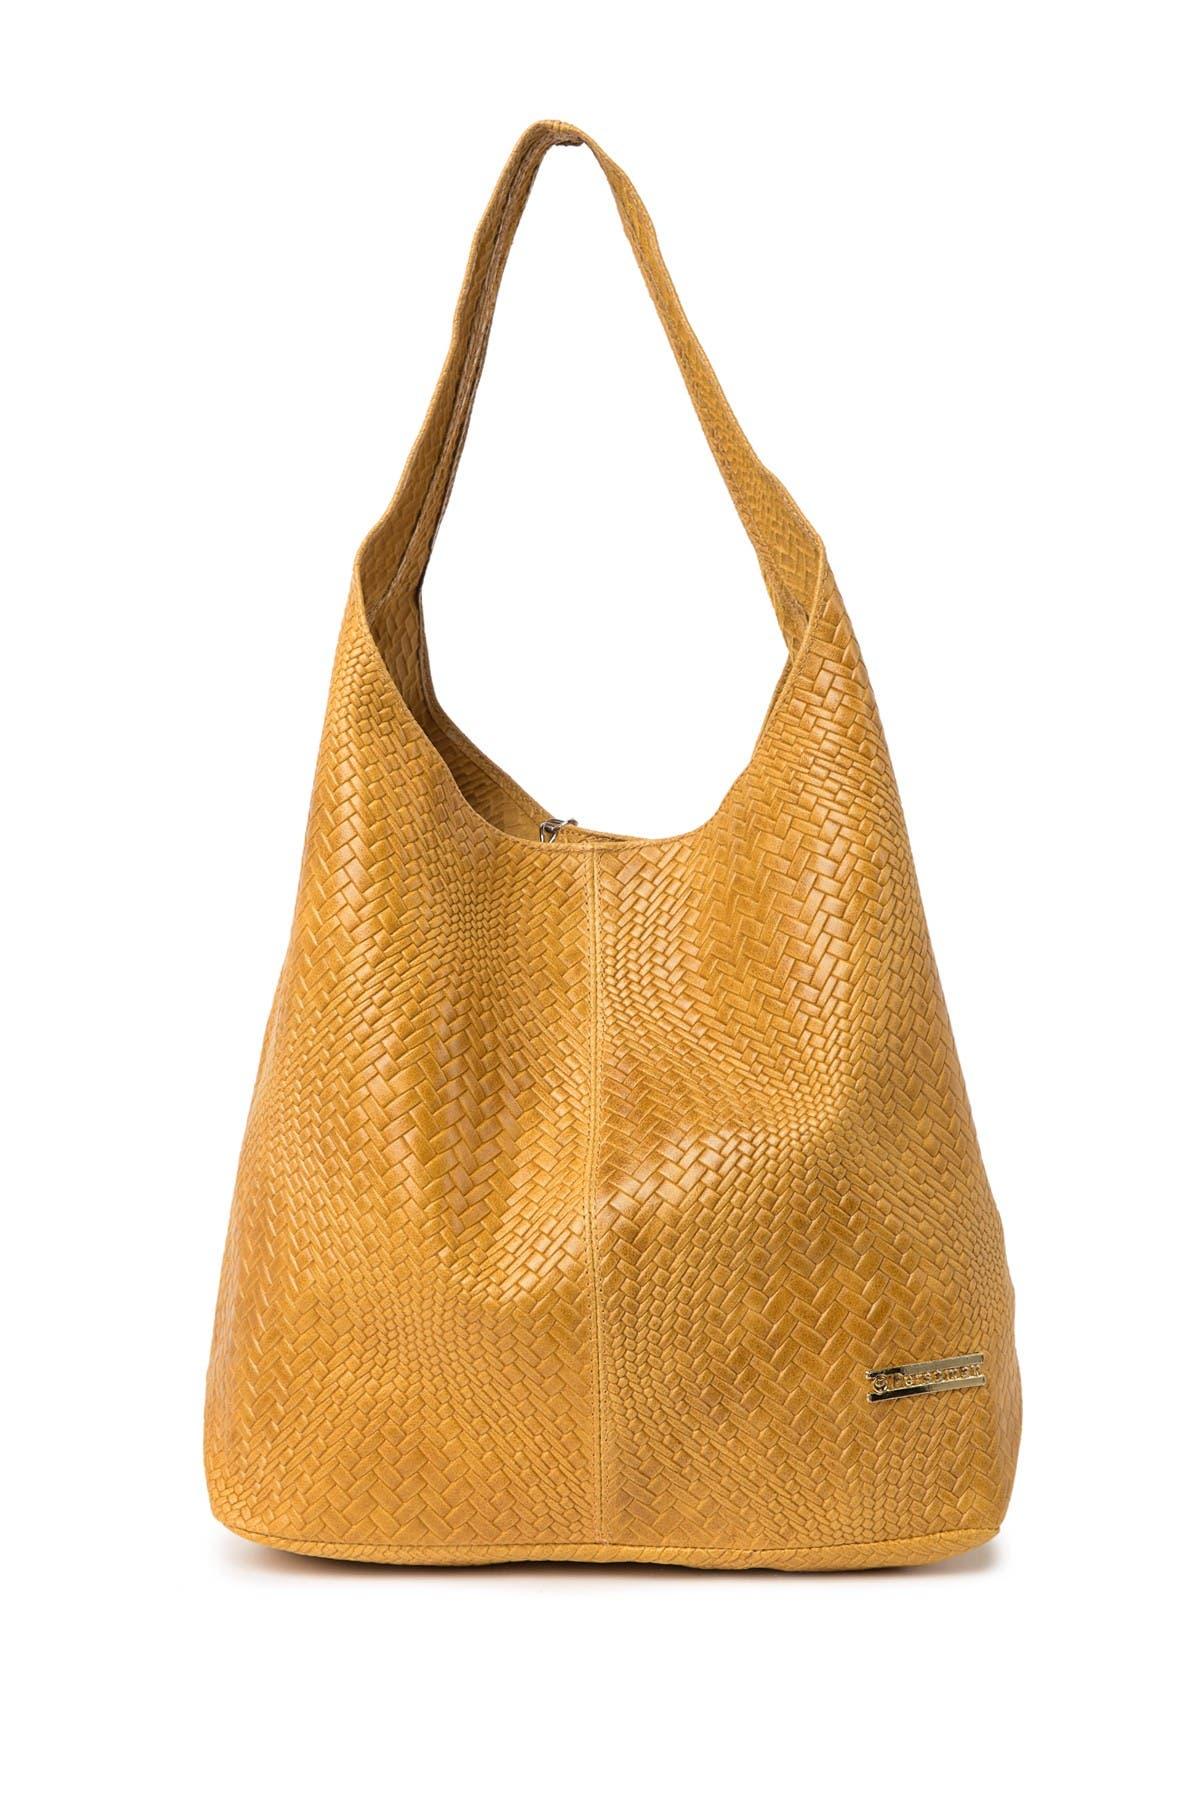 Image of Persaman New York Camilla Embossed Leather Hobo Bag